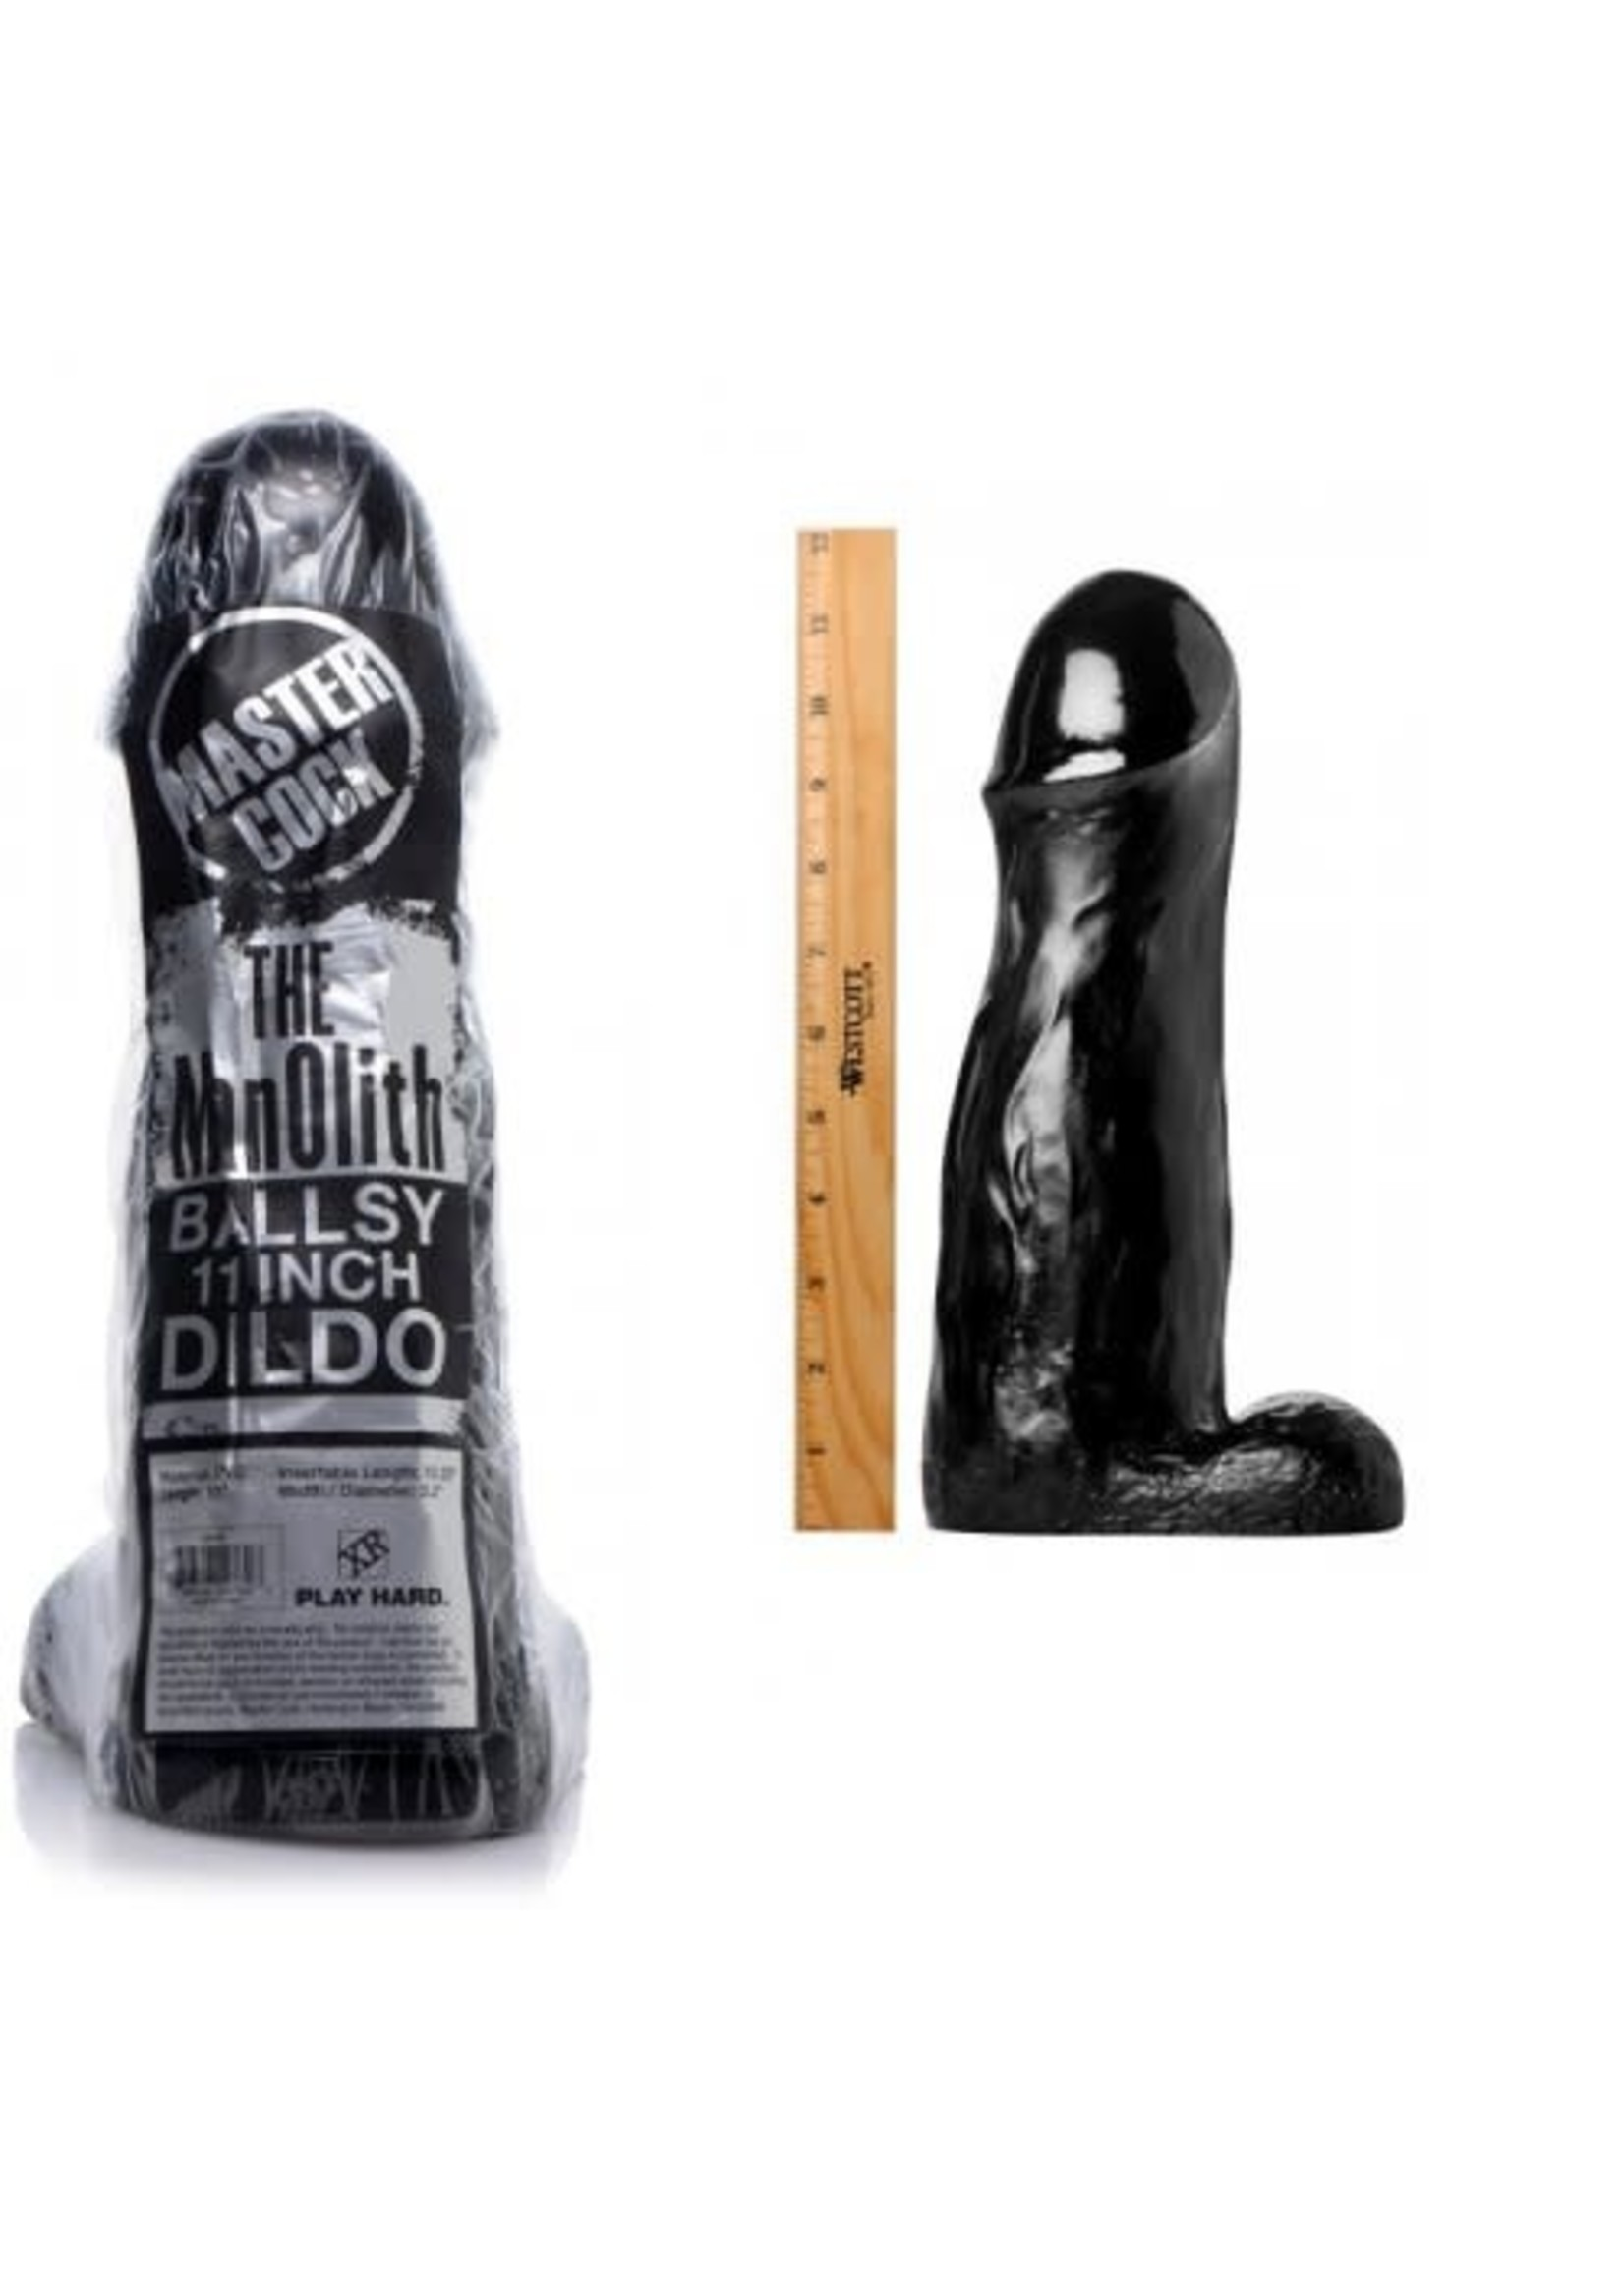 Master Cock ManOlith Dildo